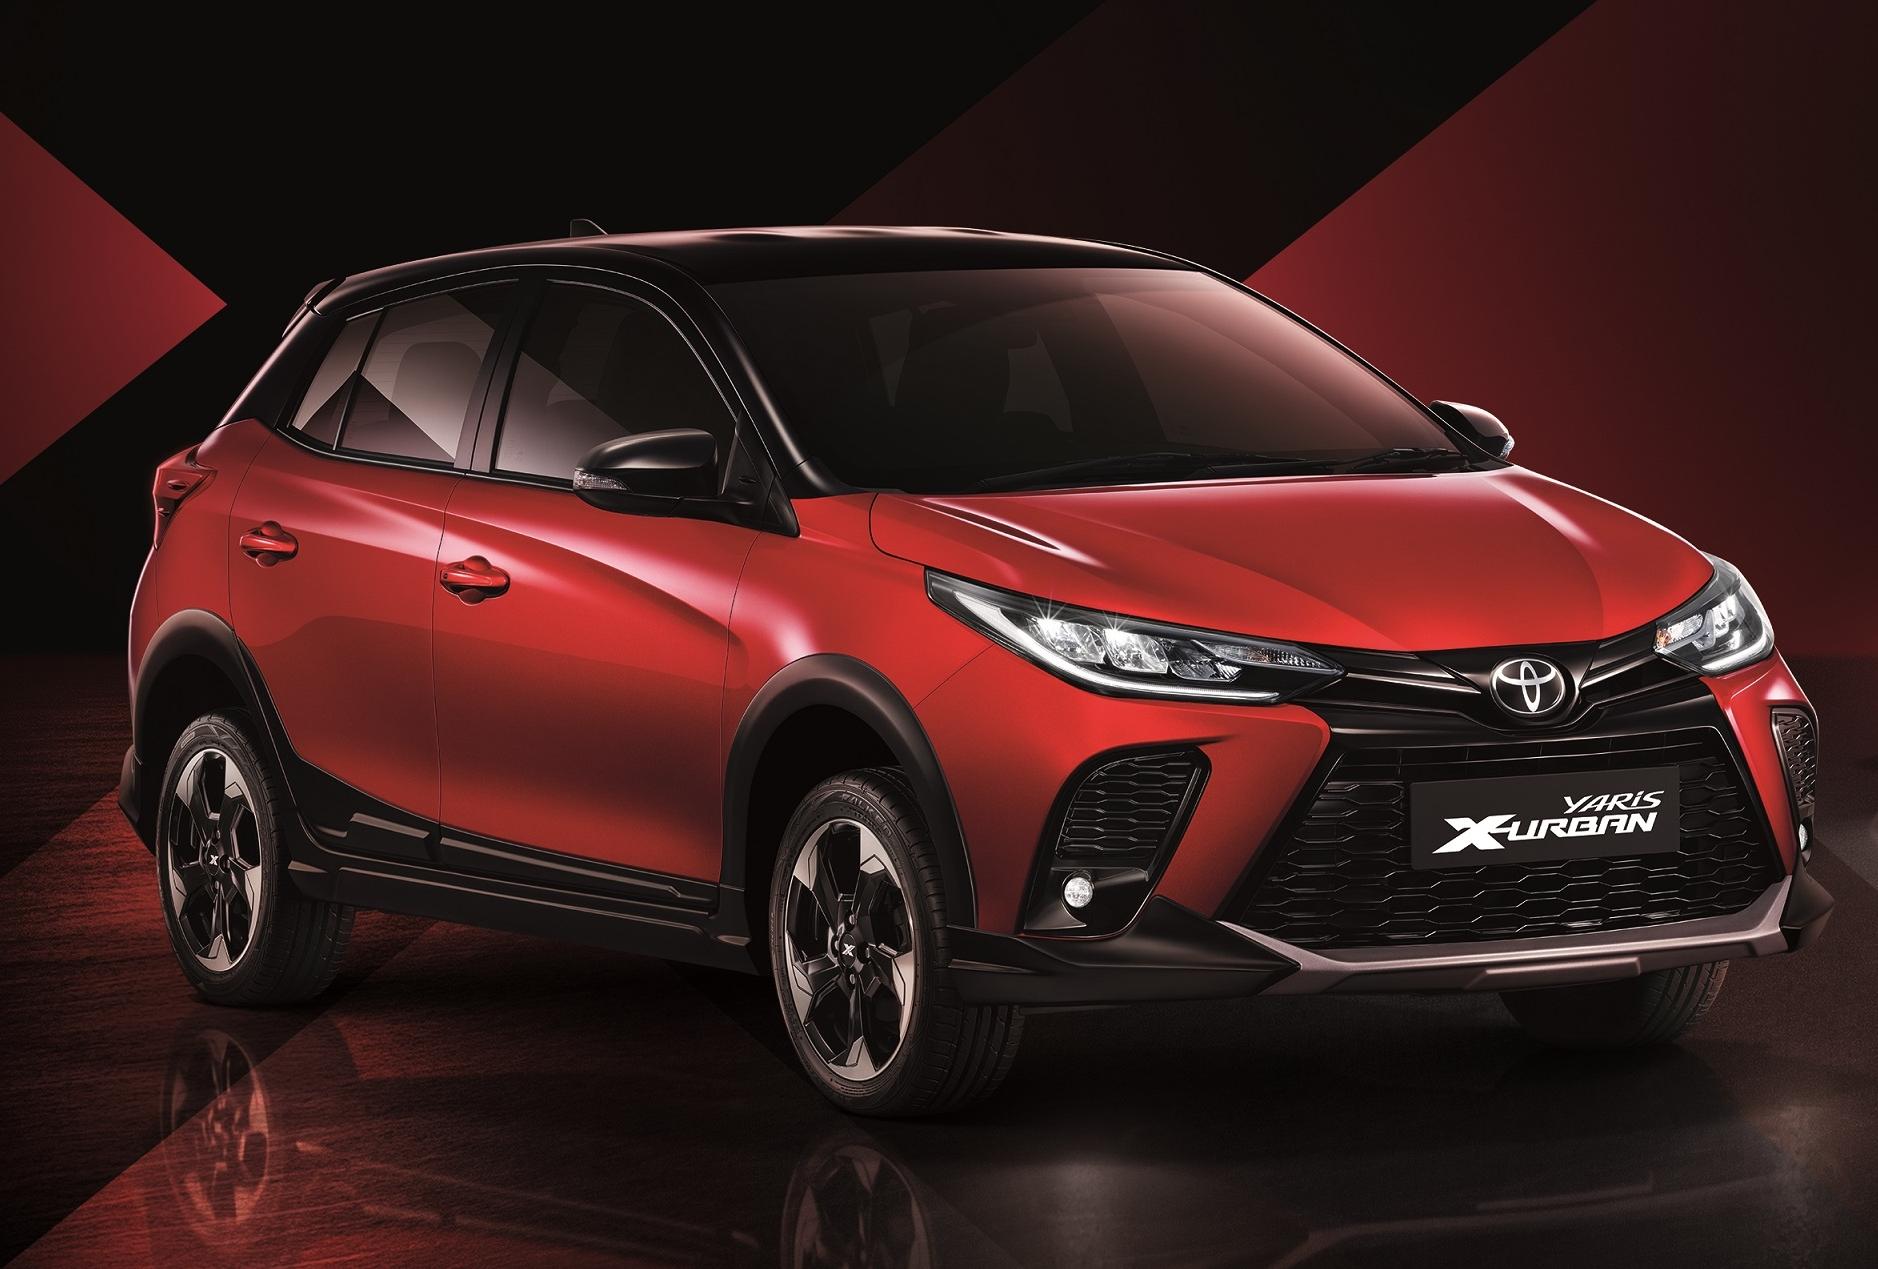 Toyota Yaris Ativ 2021 X-Urban Flash II Package AutoinfoOnline (26)